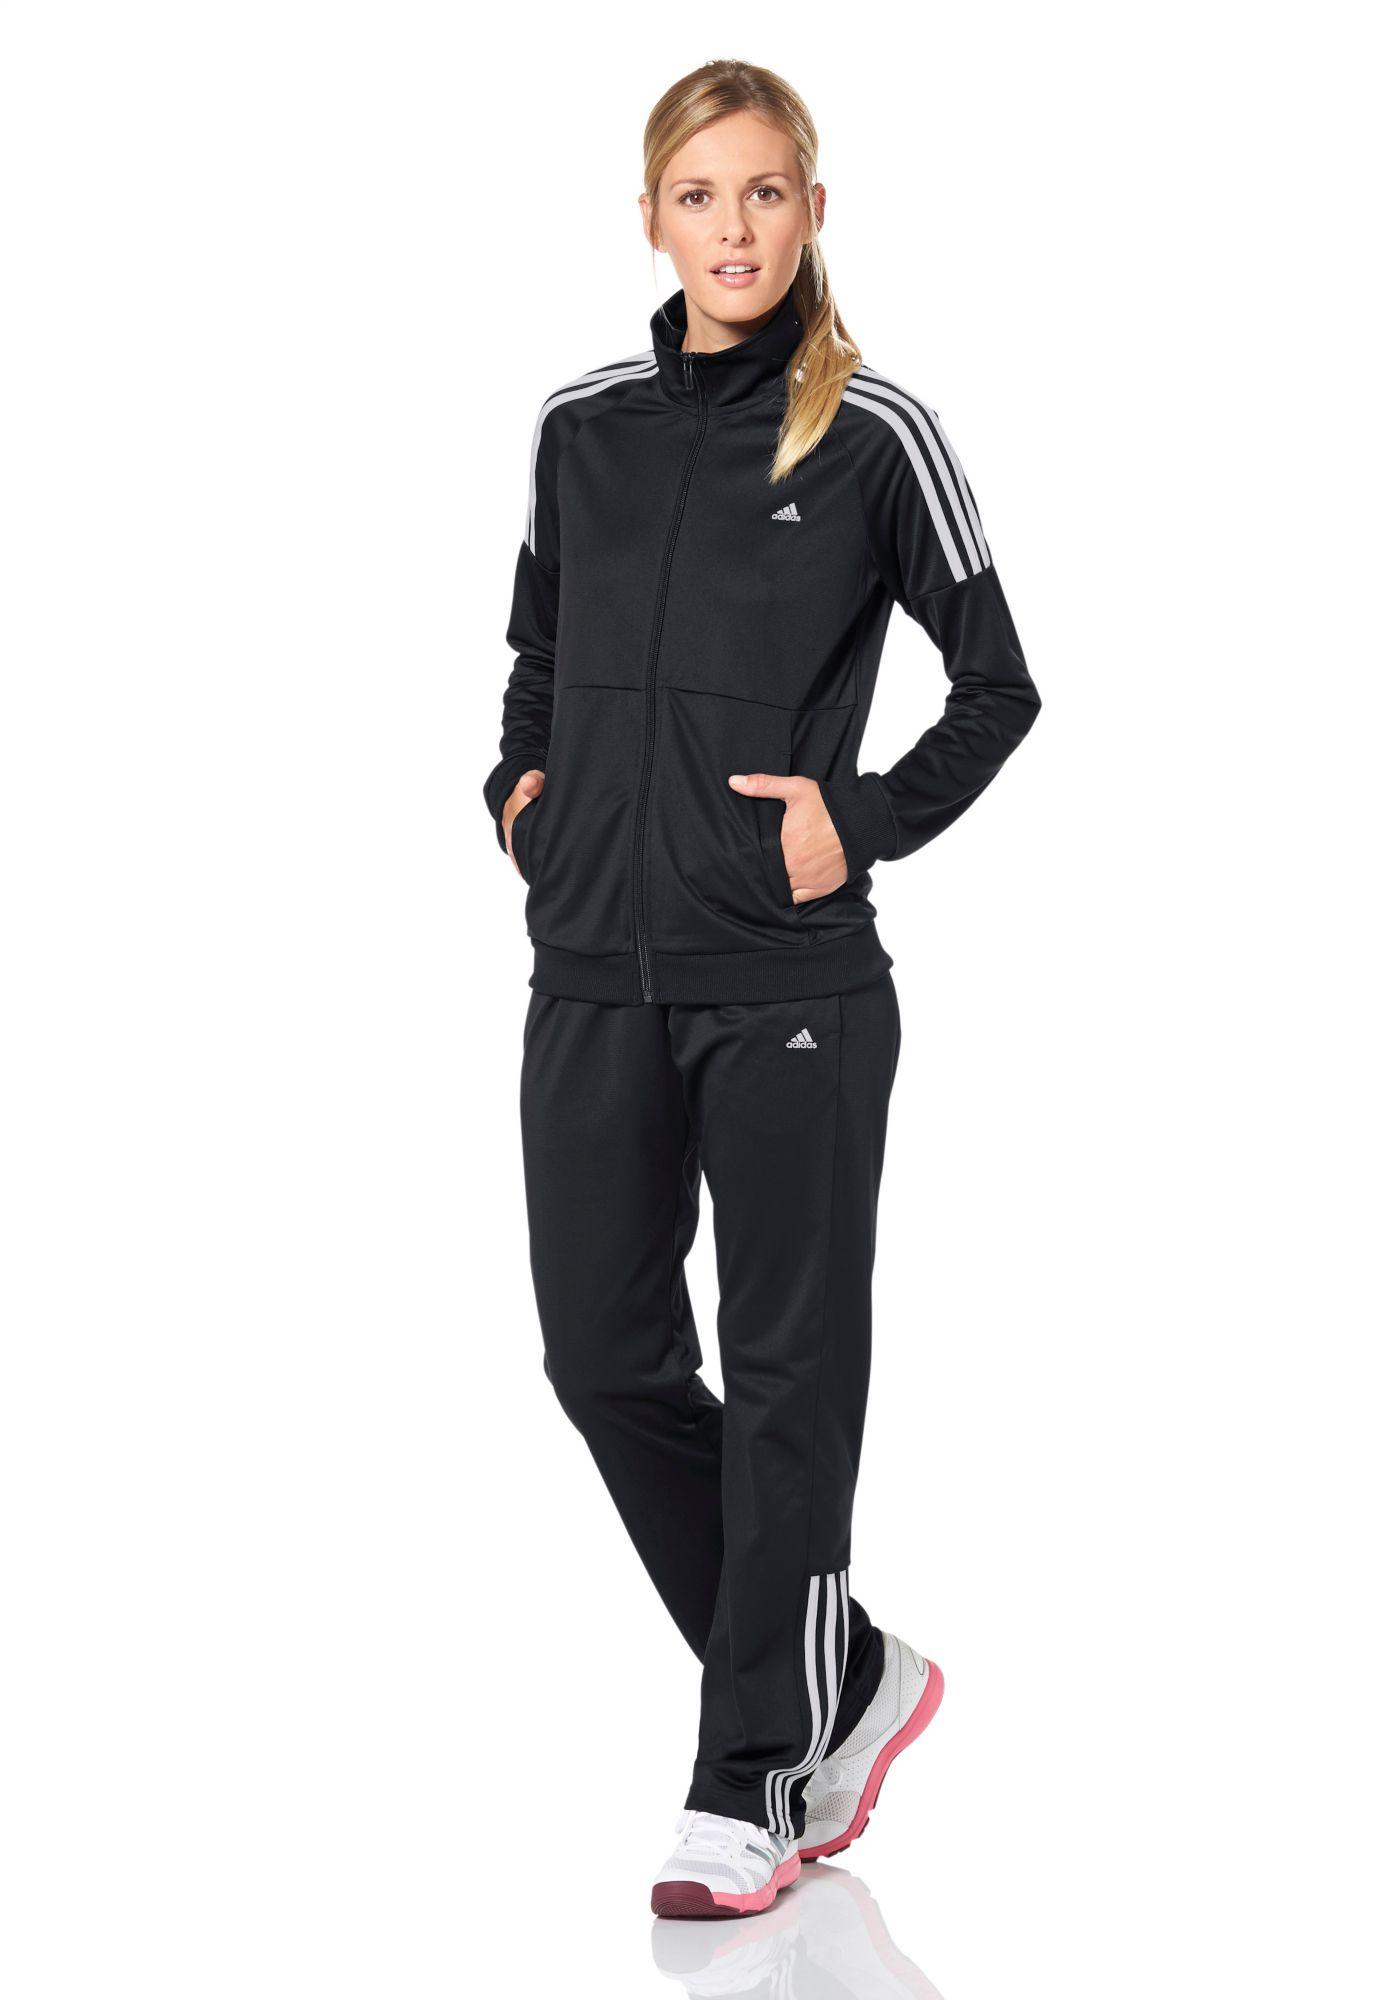 ADIDAS PERFORMANCE adidas Performance FRIEDA SUIT Trainingsanzug